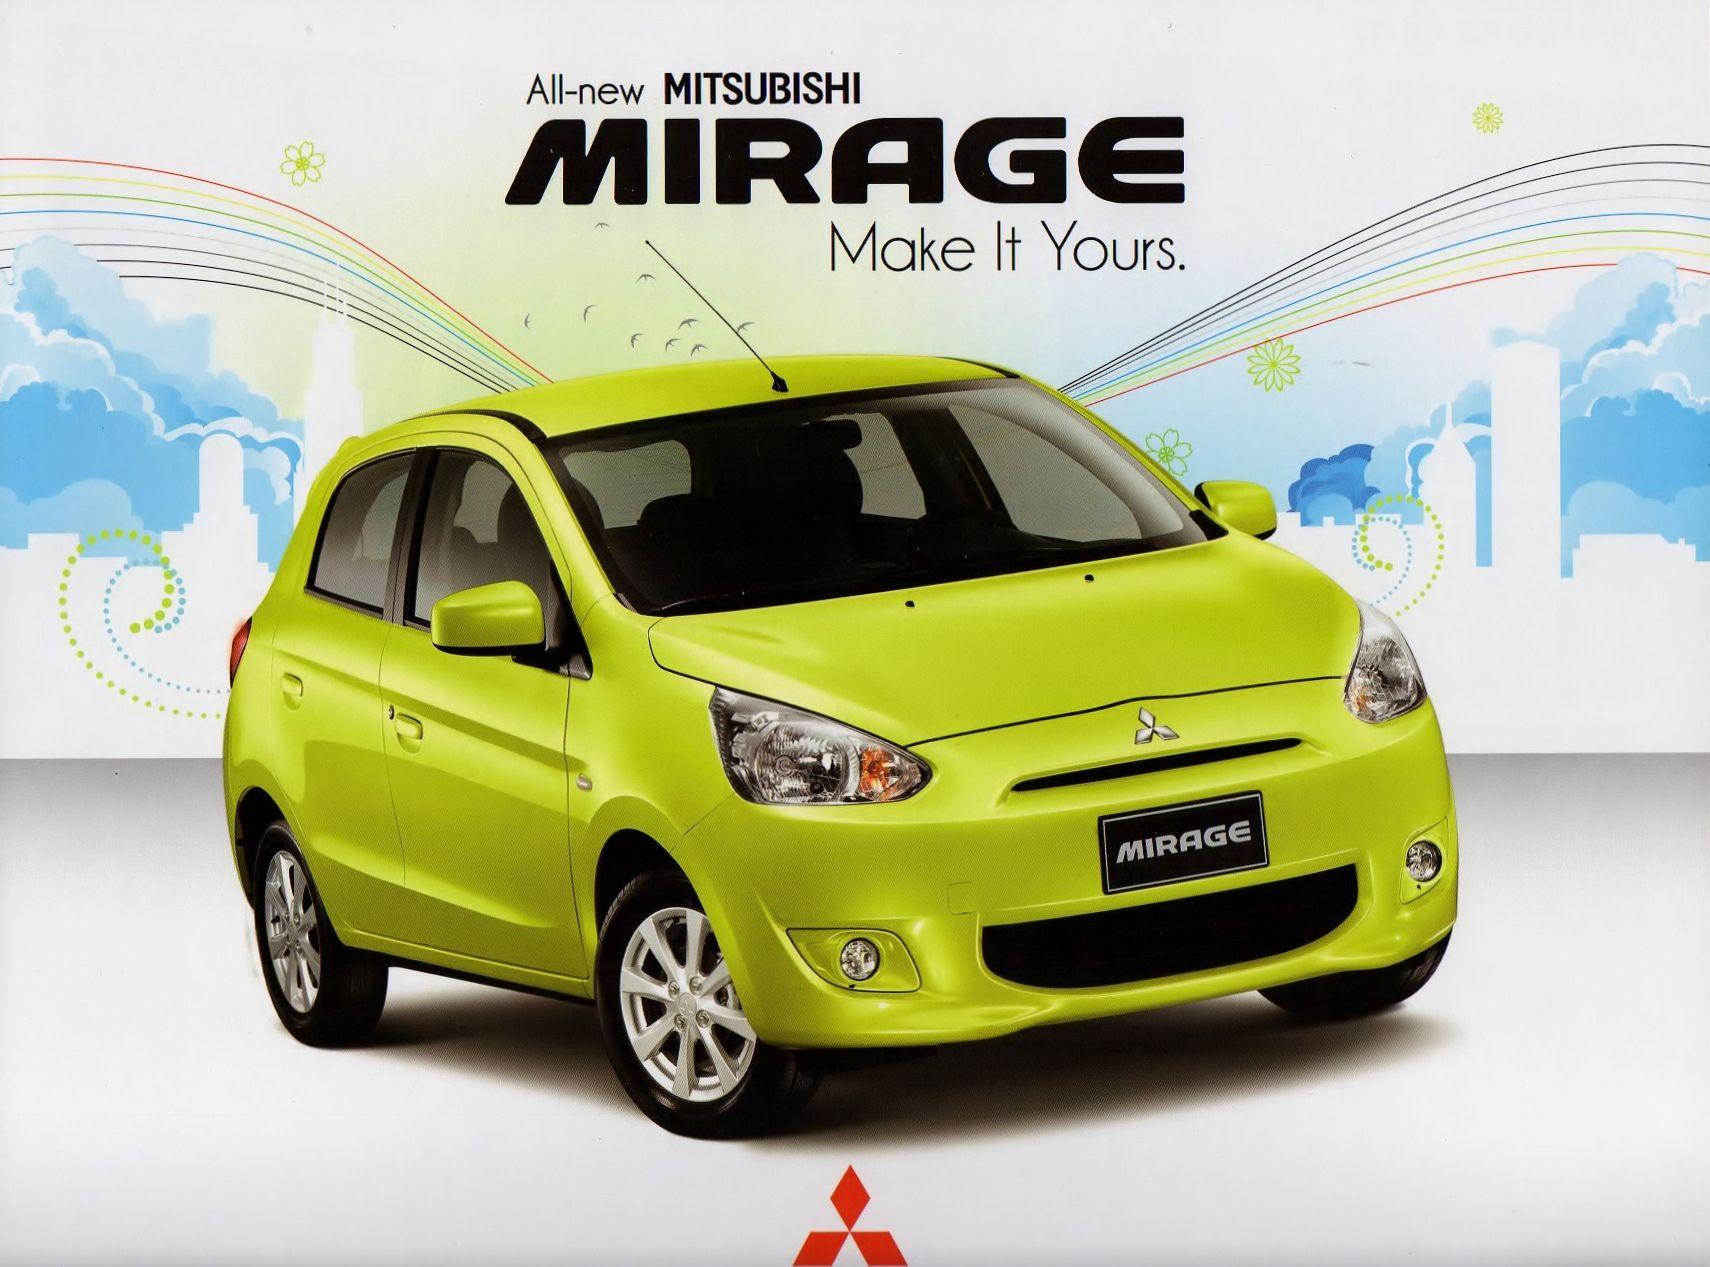 Mitsubishi Motor Philippines Price List Auto Search Philippines Mitsubishi Mitsubishi Mirage Best Car Deals